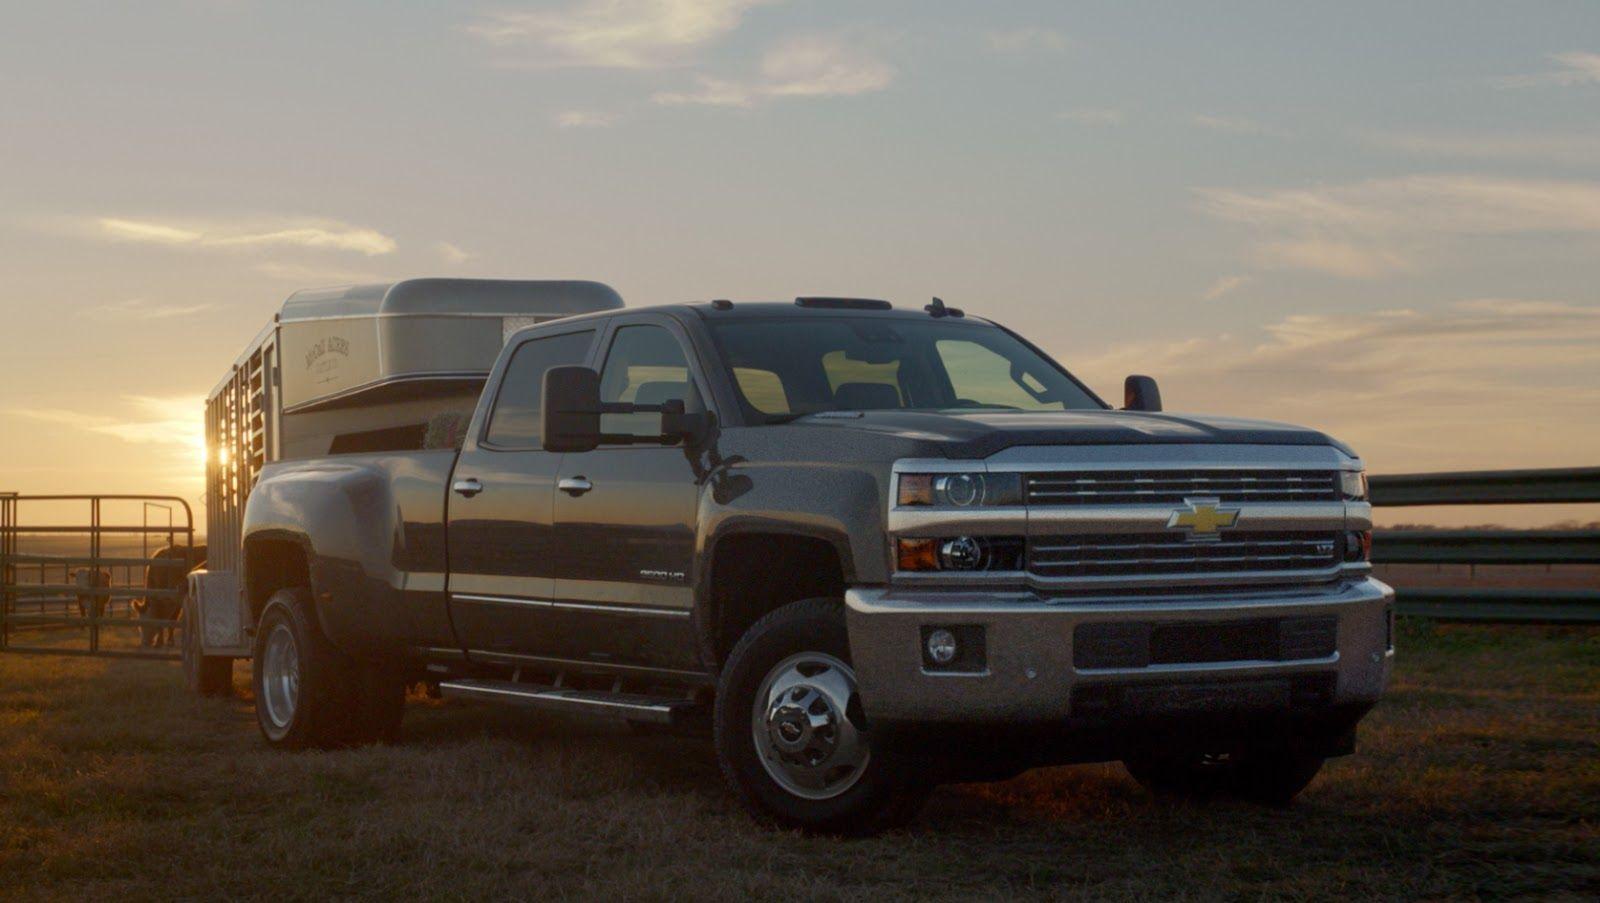 Chevrolet Returns To The Super Bowl Silverado Hd Chevy